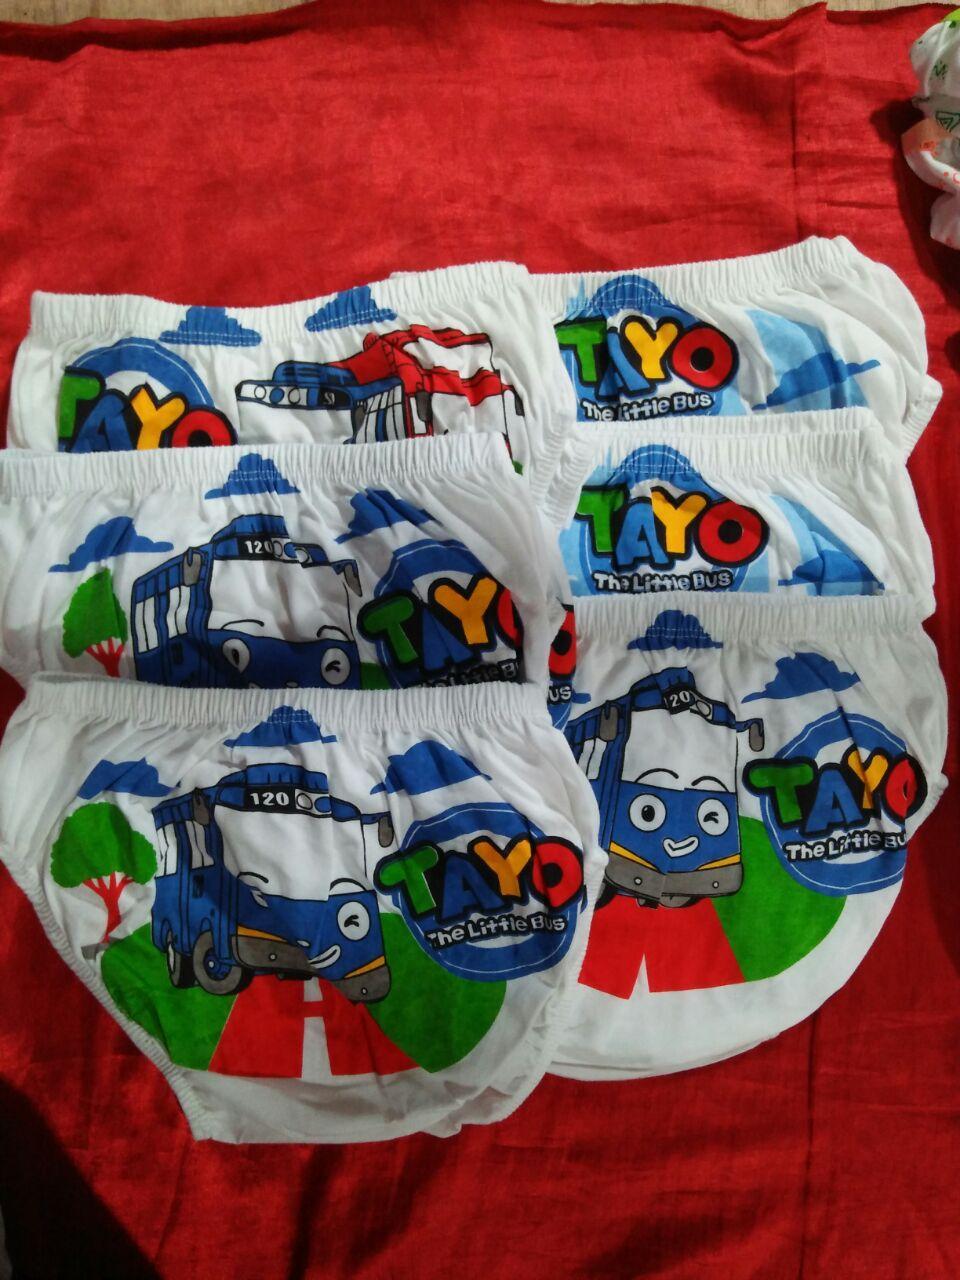 Buy Sell Cheapest Tayo L Biru Best Quality Product Deals Boneka Mobil Besar Ukuran Xl Ciput 6 Pcs Celana Dalam Anak Laki Size